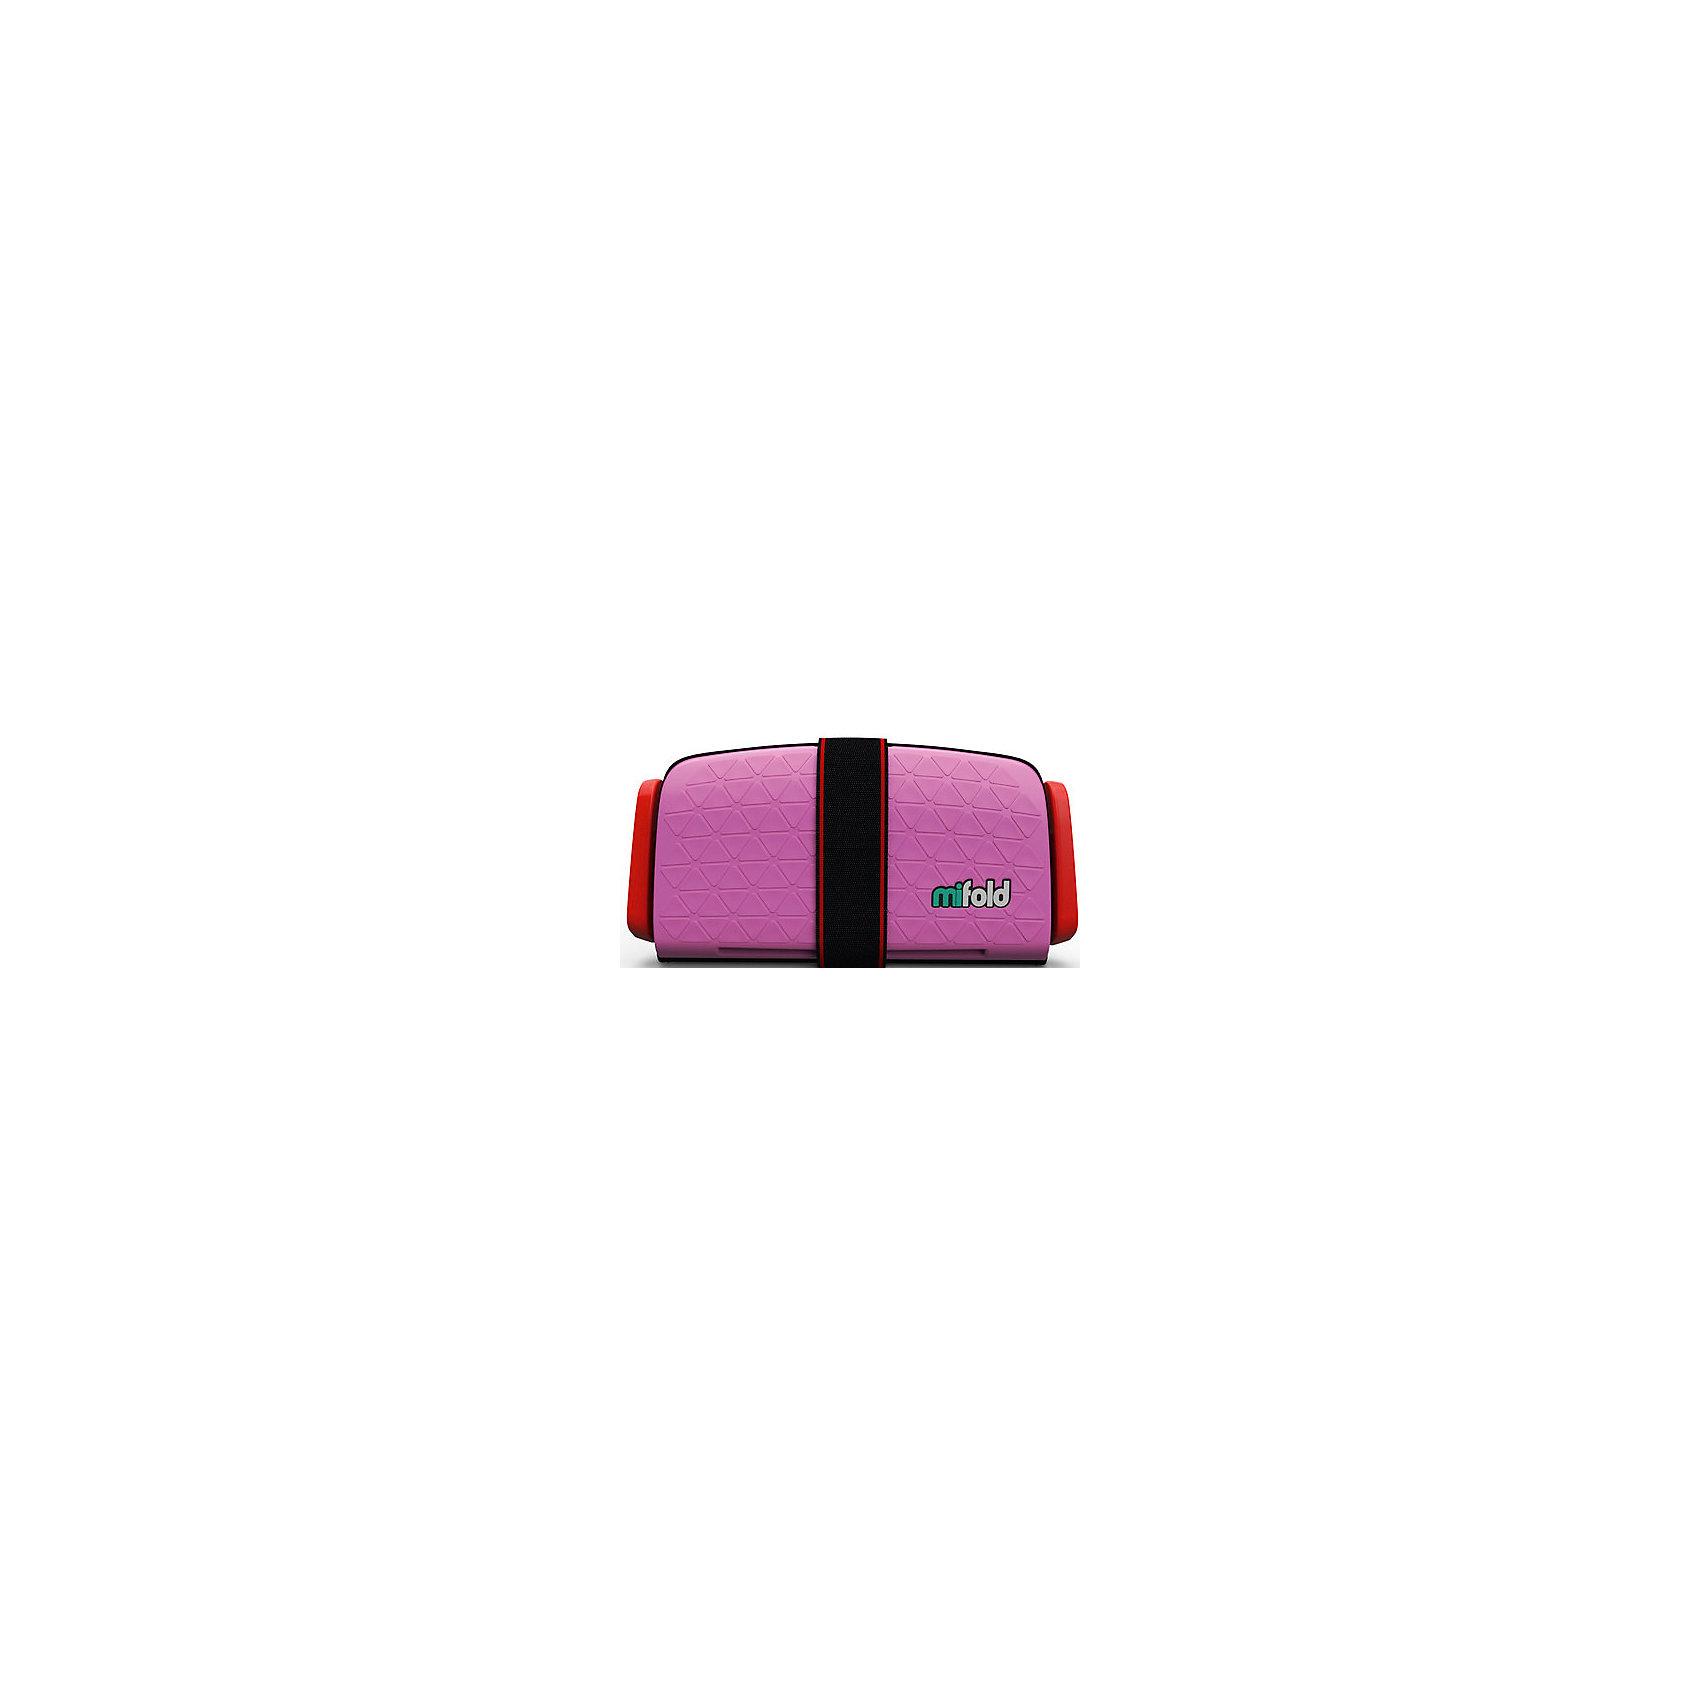 Автокресло-бустер Mifold 15-36 кг, perfect pinkБустеры<br>Бустер автомобильный Mifold - the Grab-and-Go Booster seat/Perfect Pink<br><br>Ширина мм: 168<br>Глубина мм: 253<br>Высота мм: 73<br>Вес г: 950<br>Возраст от месяцев: 48<br>Возраст до месяцев: 144<br>Пол: Унисекс<br>Возраст: Детский<br>SKU: 6878755